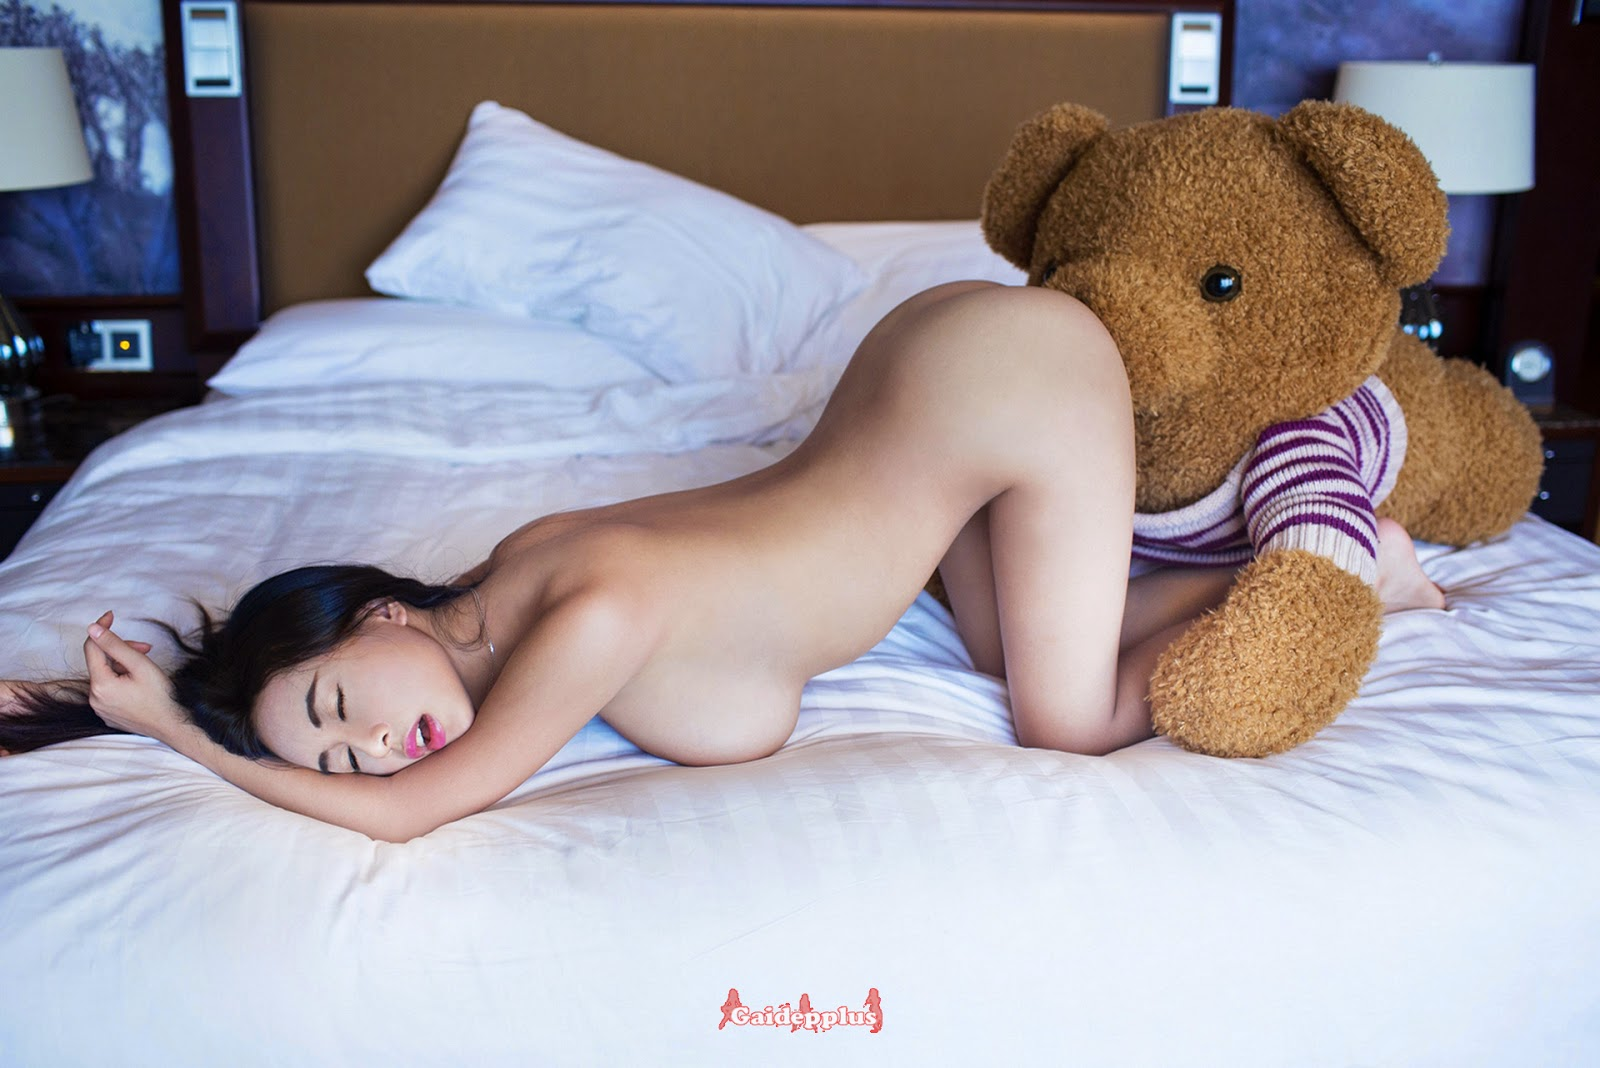 Bear grylls desnudo sin censura